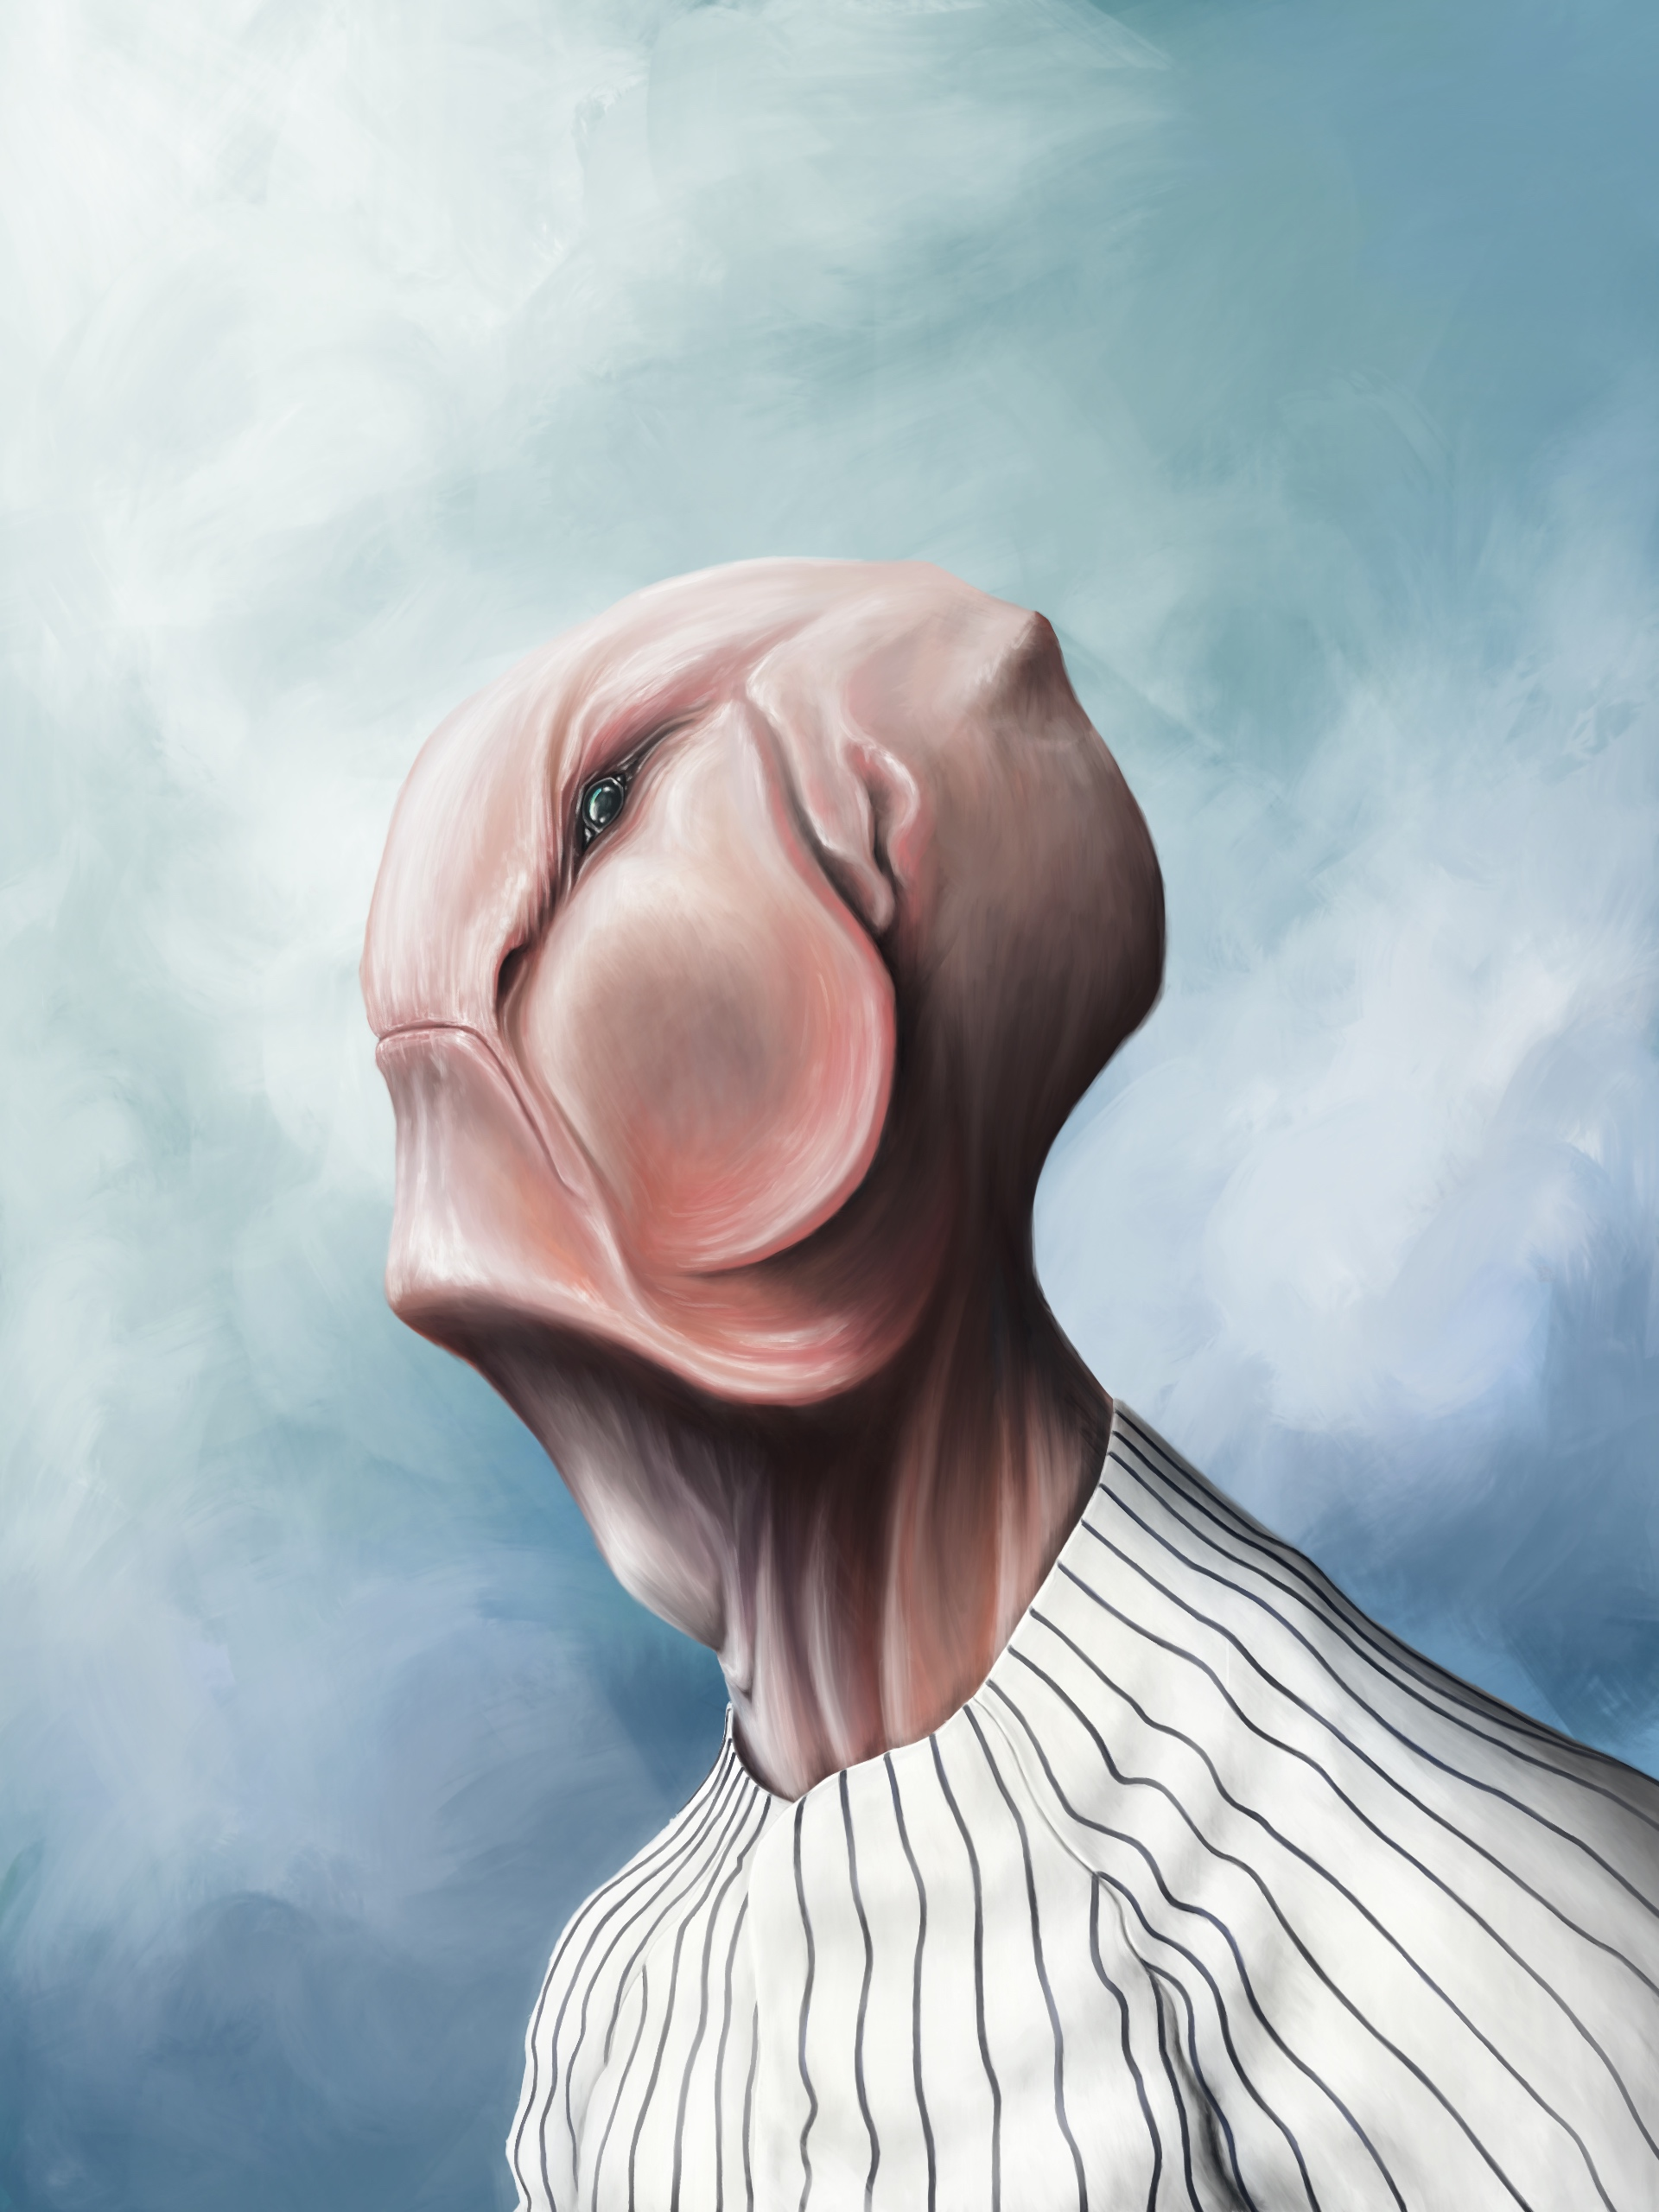 aliena baseball player, yenkees